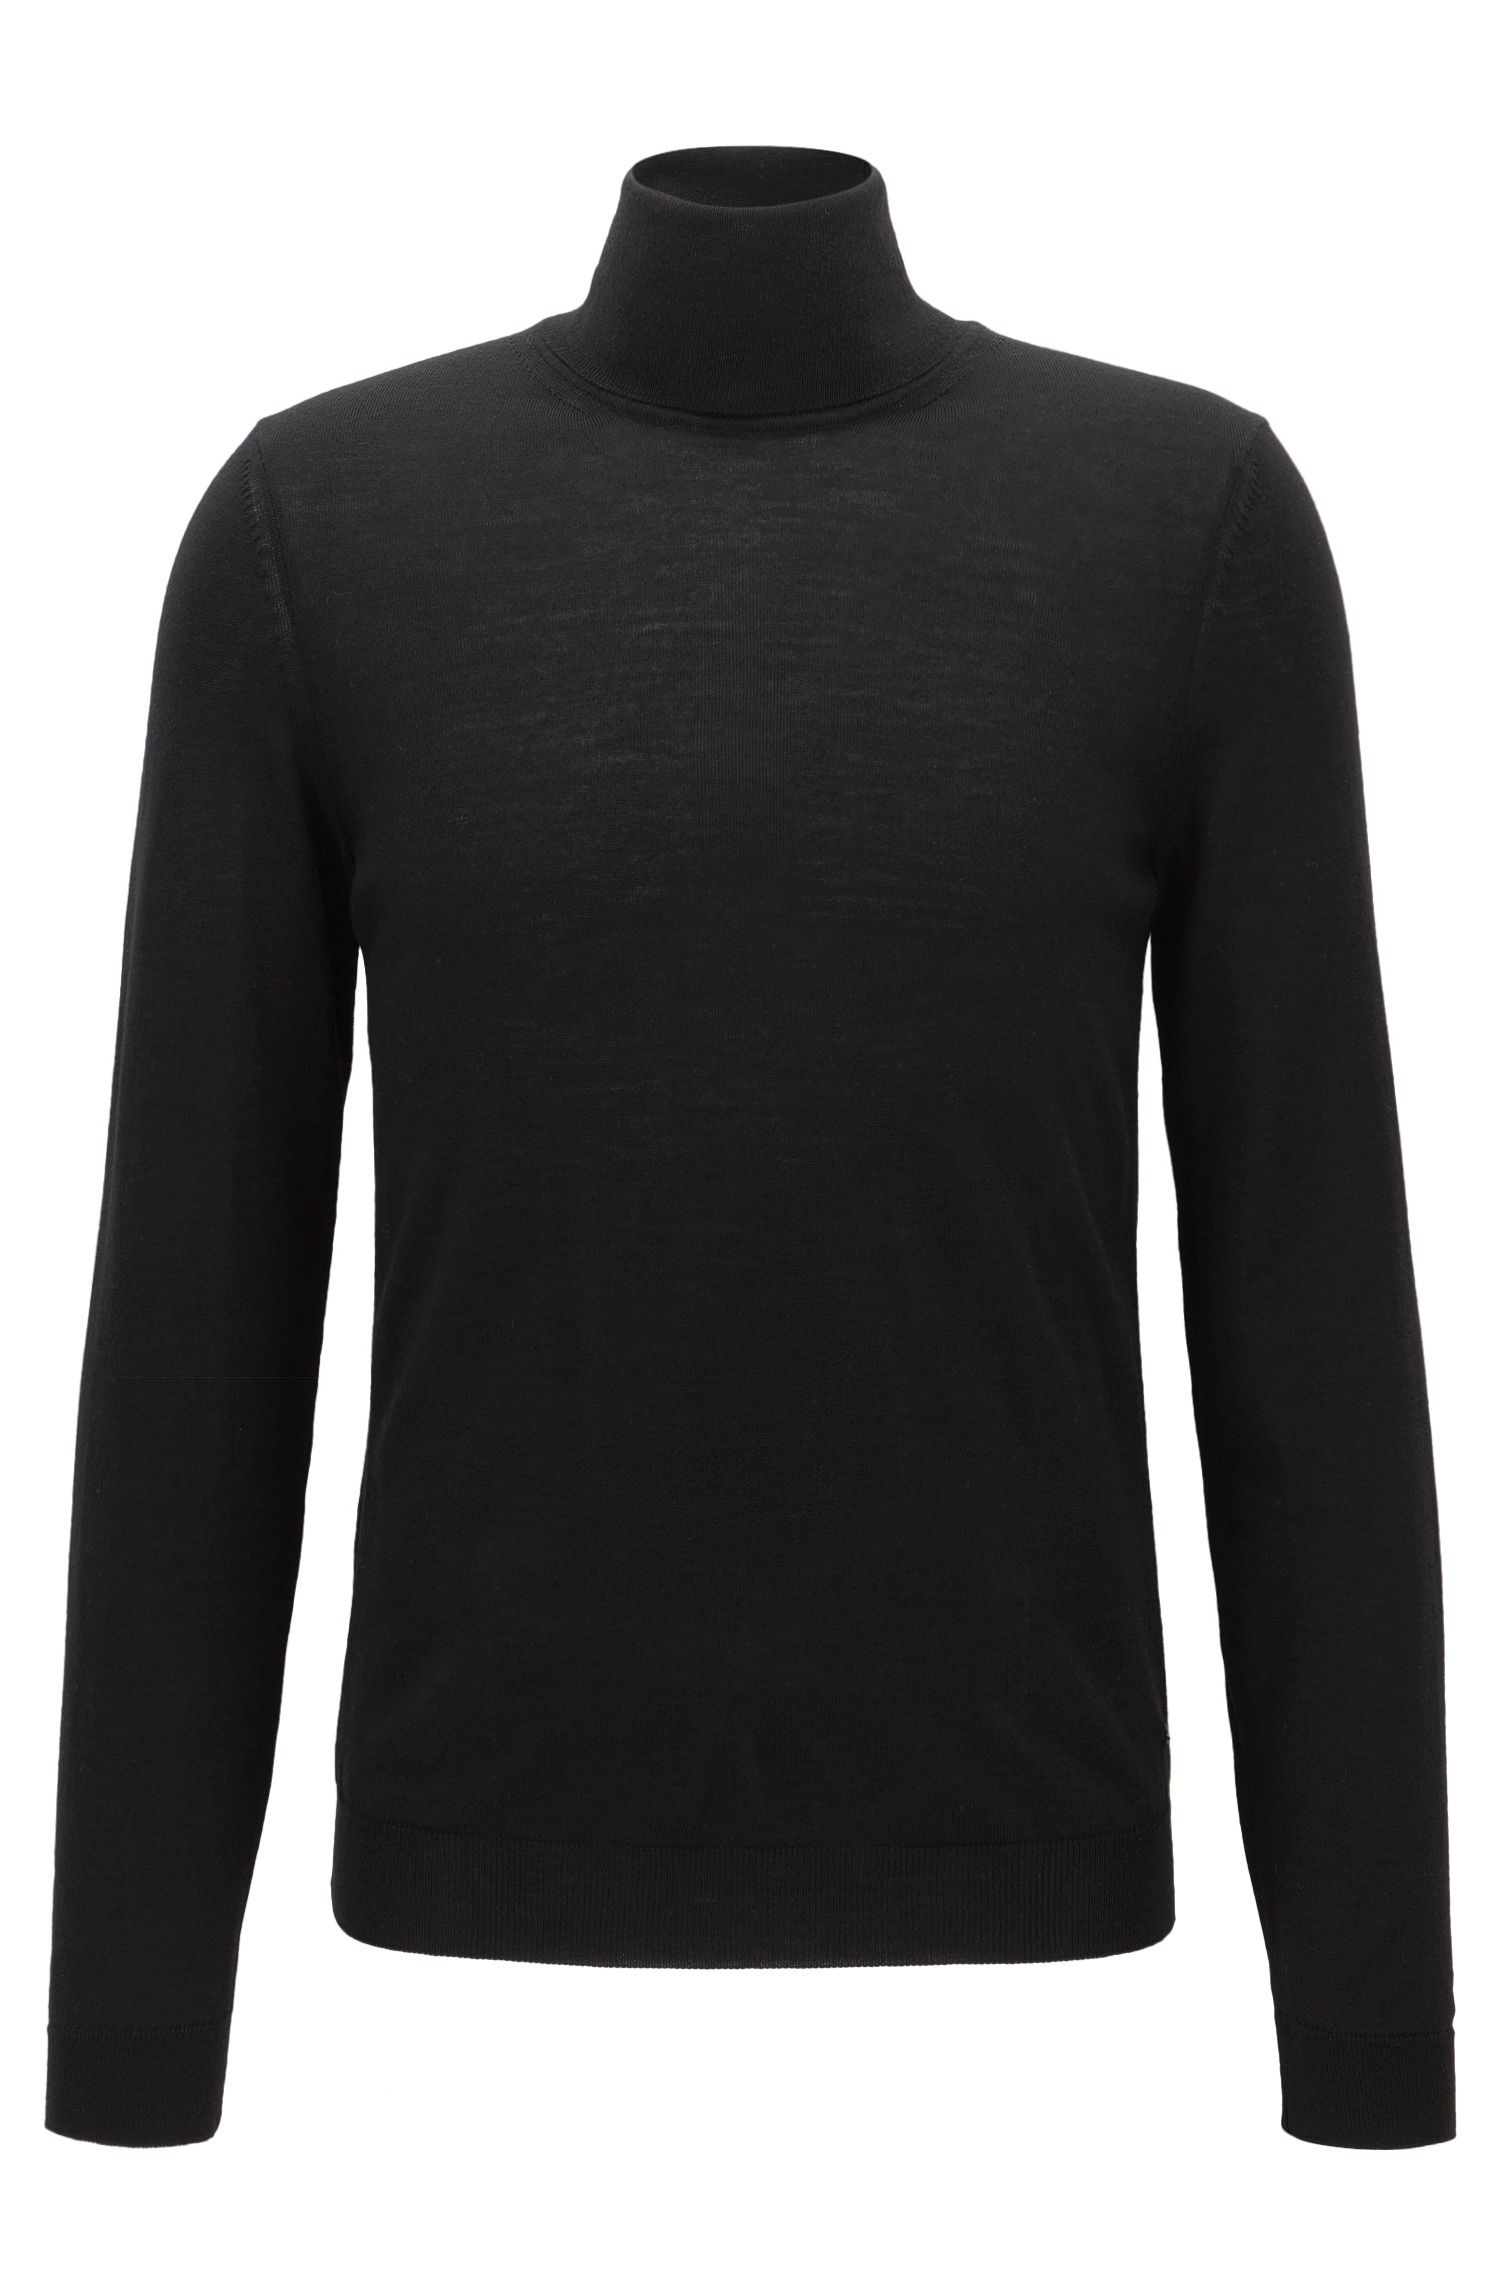 Merino Wool Turtleneck Sweater | Musso N, Black